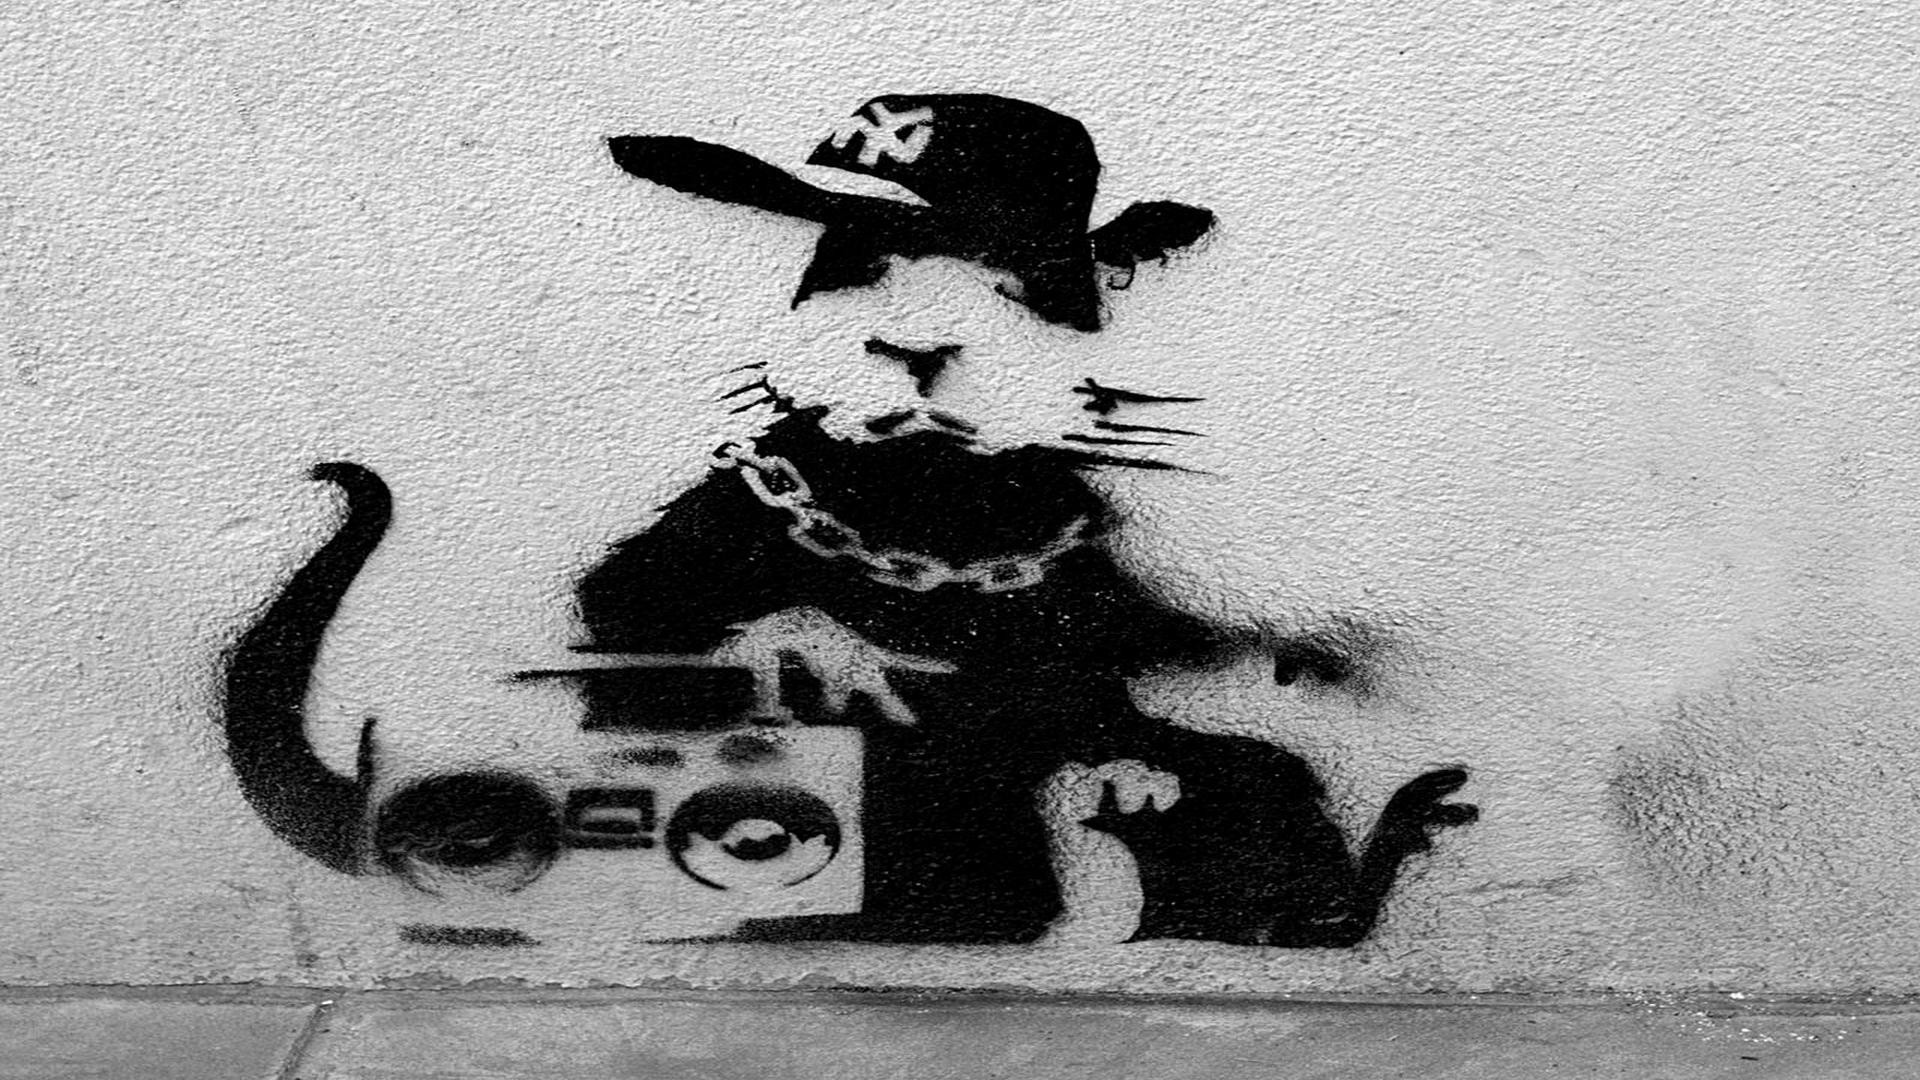 wallpaper.wiki-Banksy-Art-Bakcground-Full-HD-PIC-